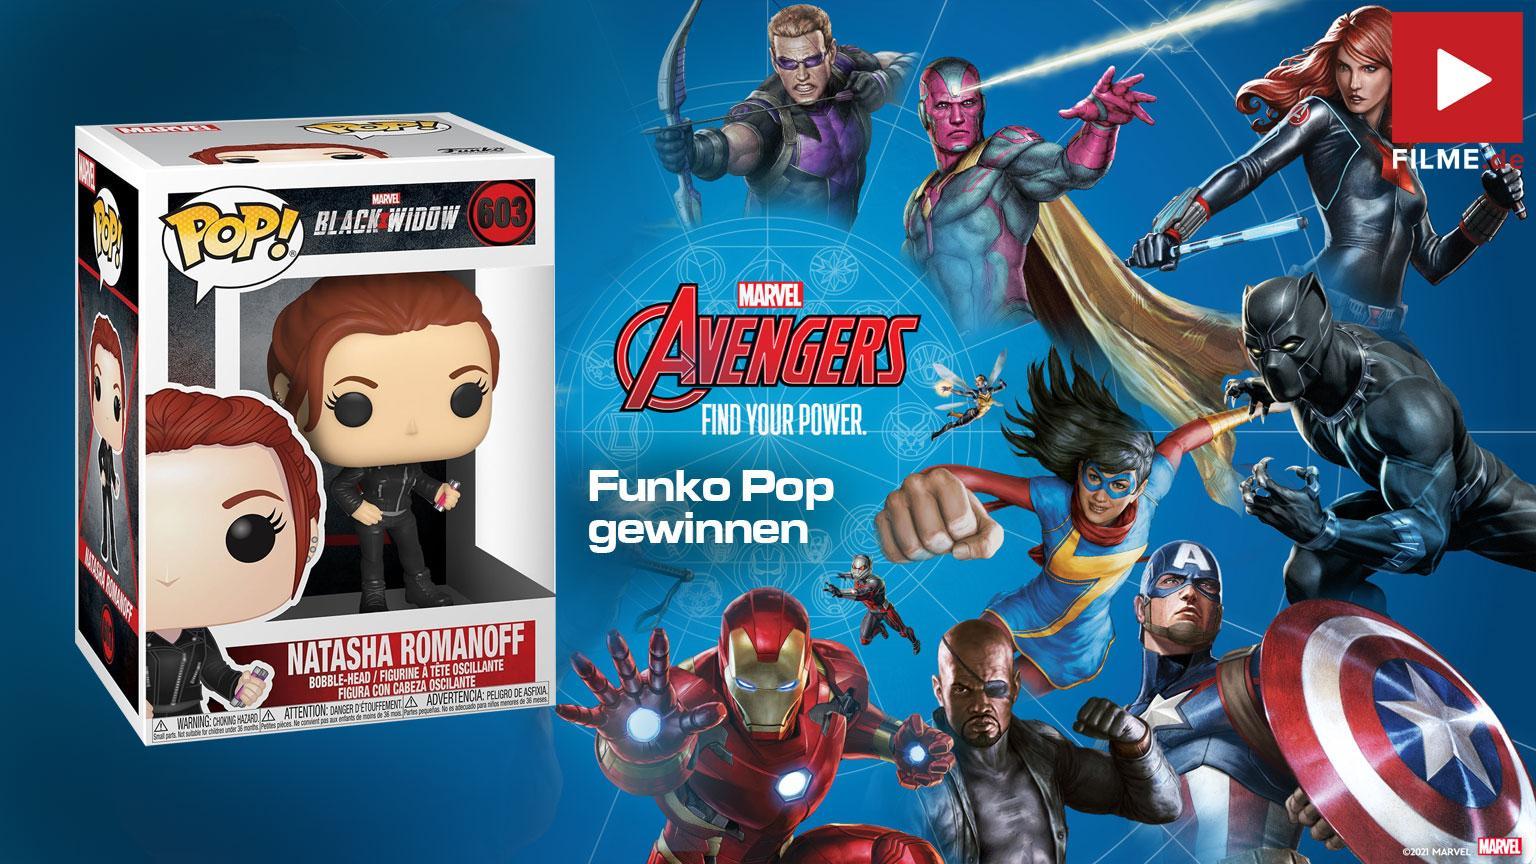 Avengers: Find Your Power Funko Pop Gewinnspiel Disney gewinnen shop kaufen